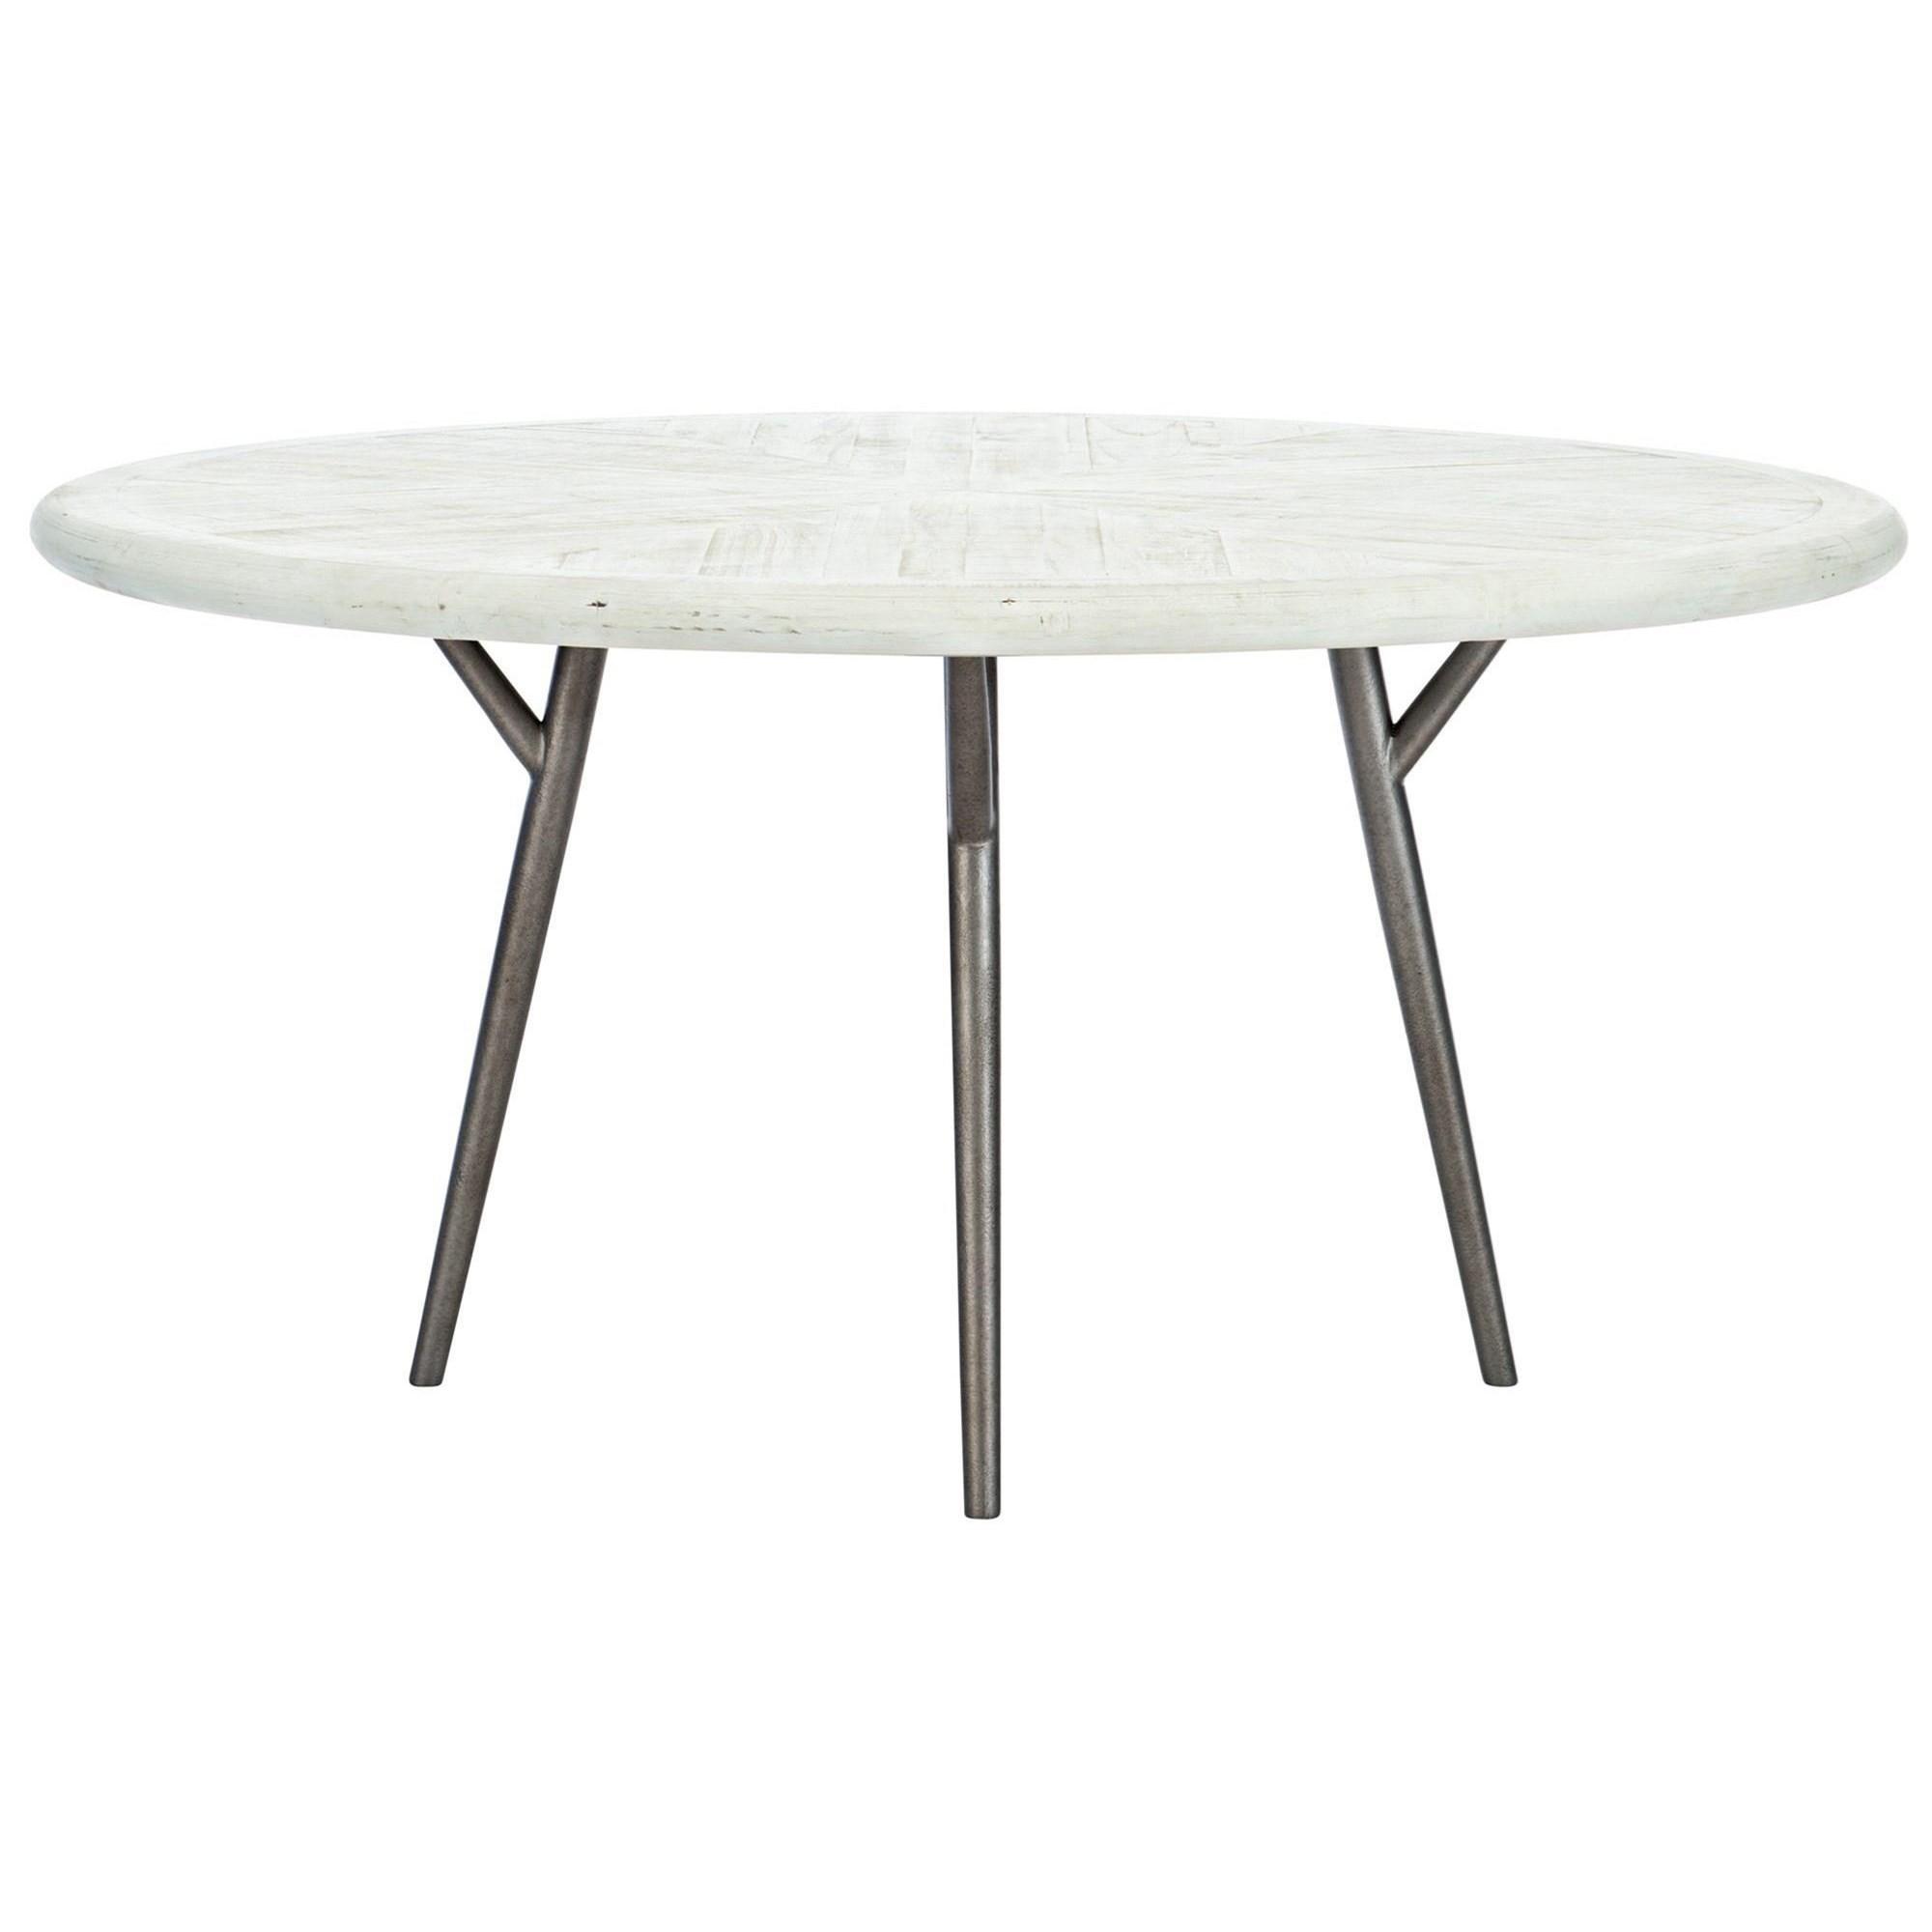 Loft - Highland Park Presley Round Dining Table by Bernhardt at Baer's Furniture